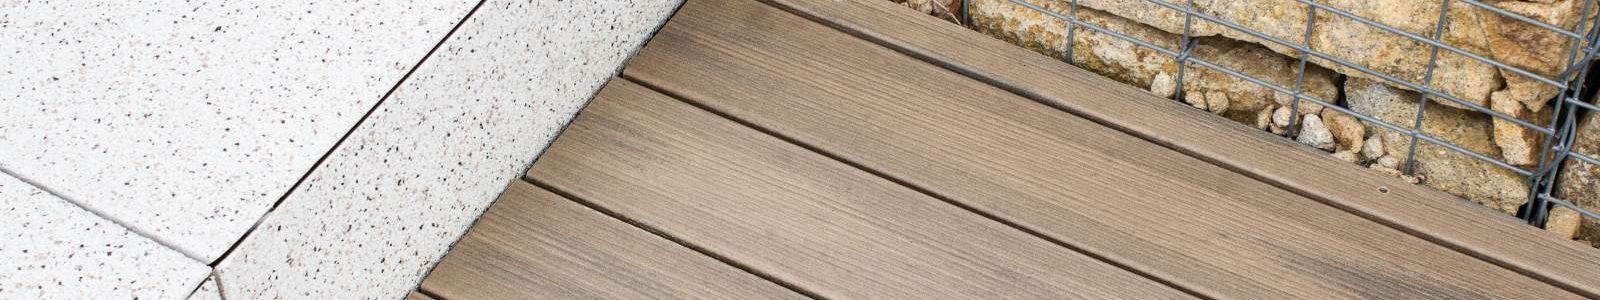 woodplastic-terasy-forest-plus-teak-2